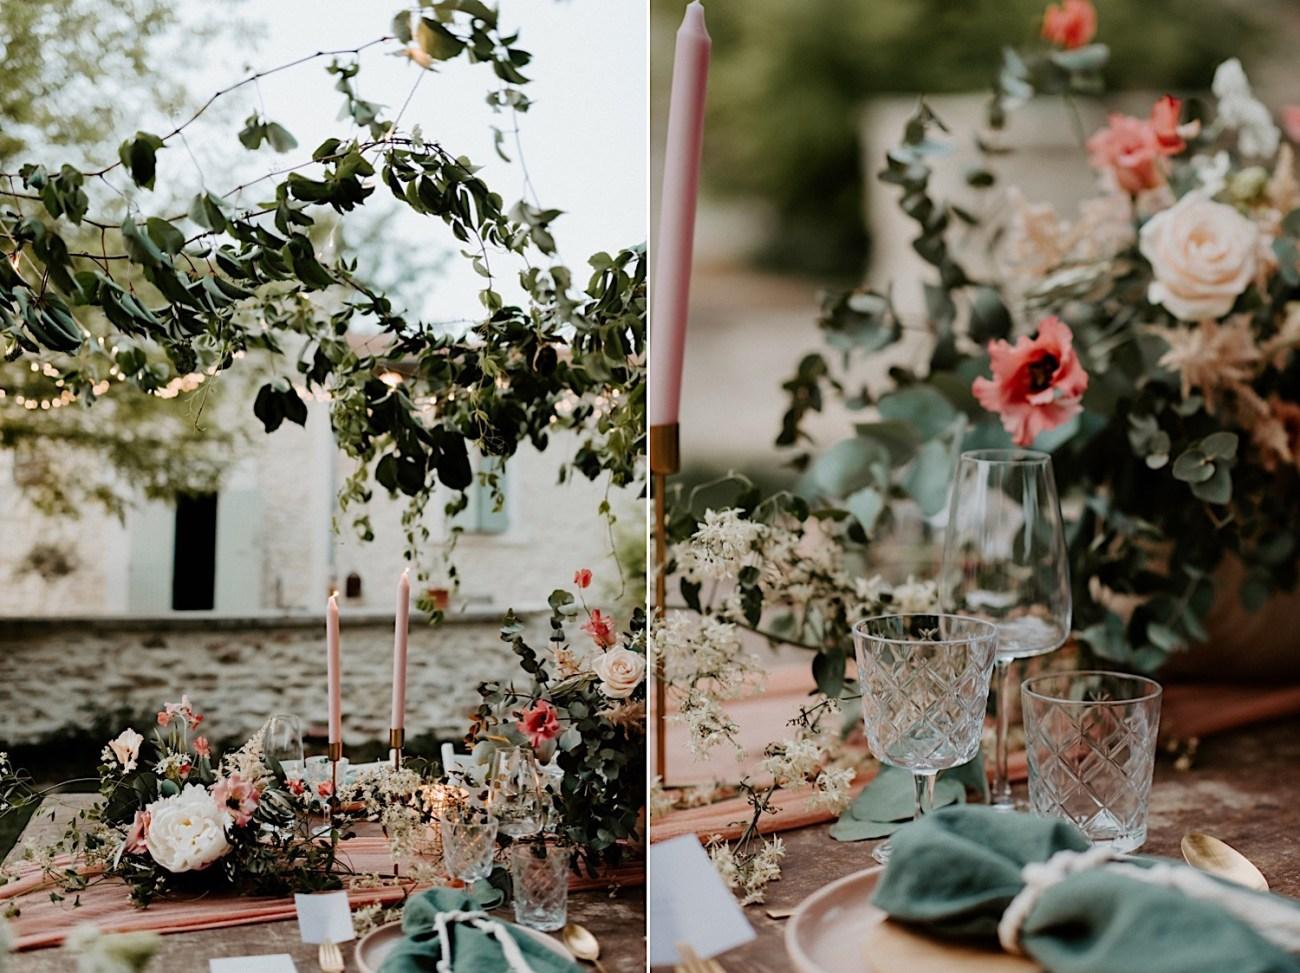 Terre Ugo Un Marriage En Provence Lavender Field Wedding French Wedding Provence Wedding Destination Wedding France Photographe De Marriage Provence France Anais Possamai Photography 36